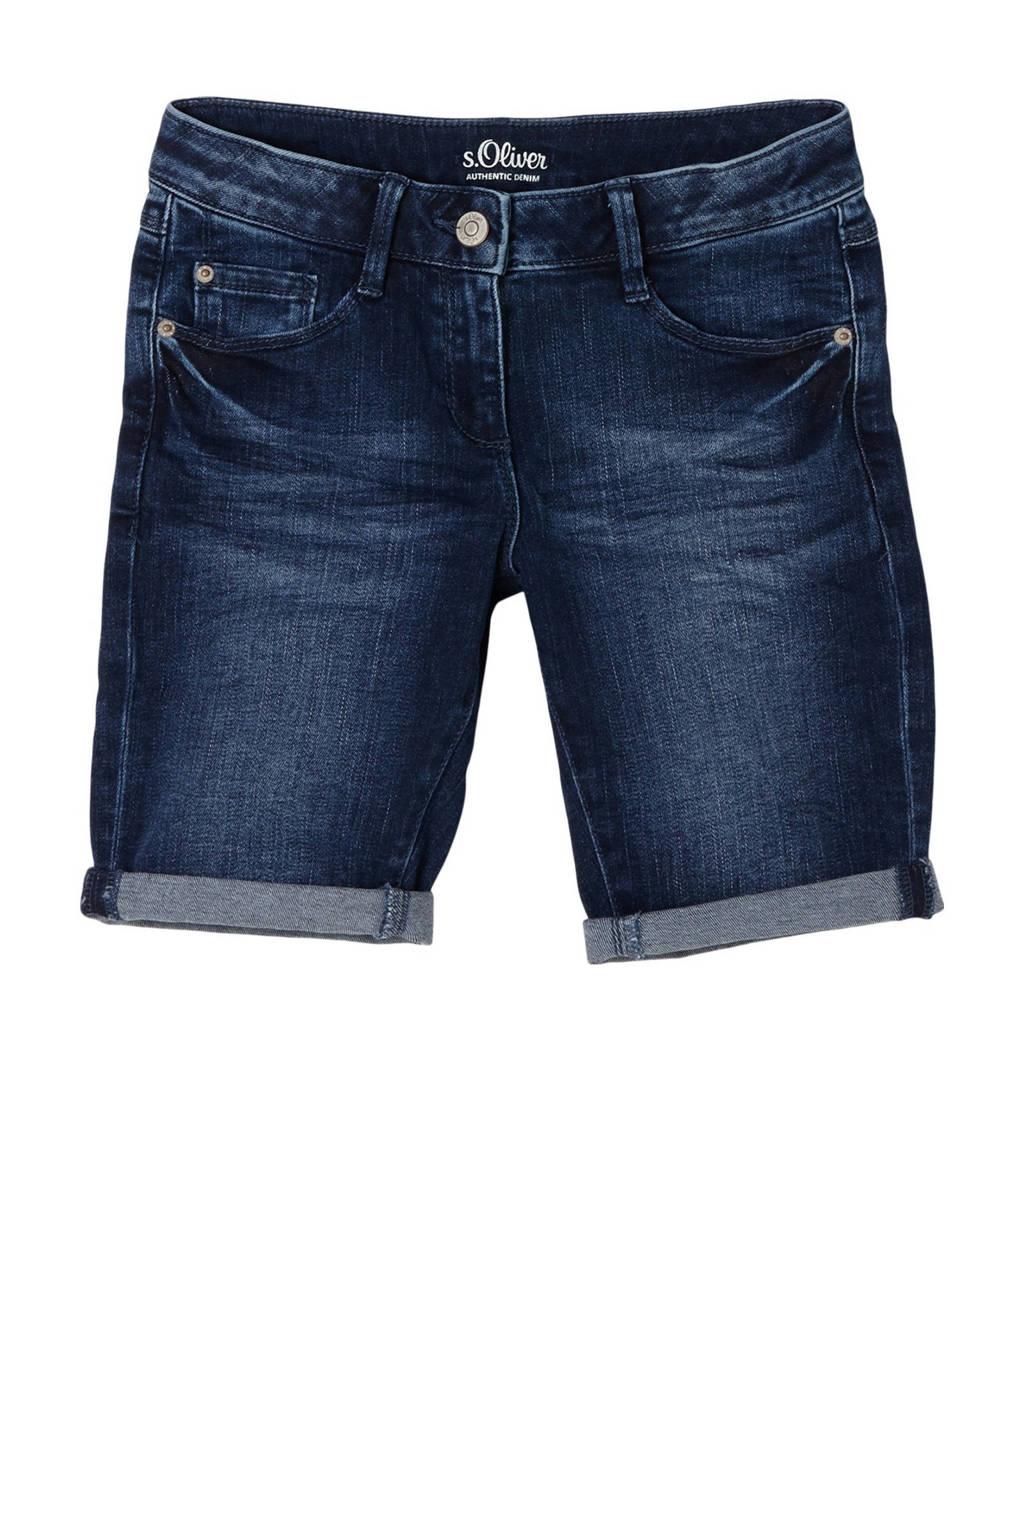 s.Oliver slim fit jeans short blauw, Blauw